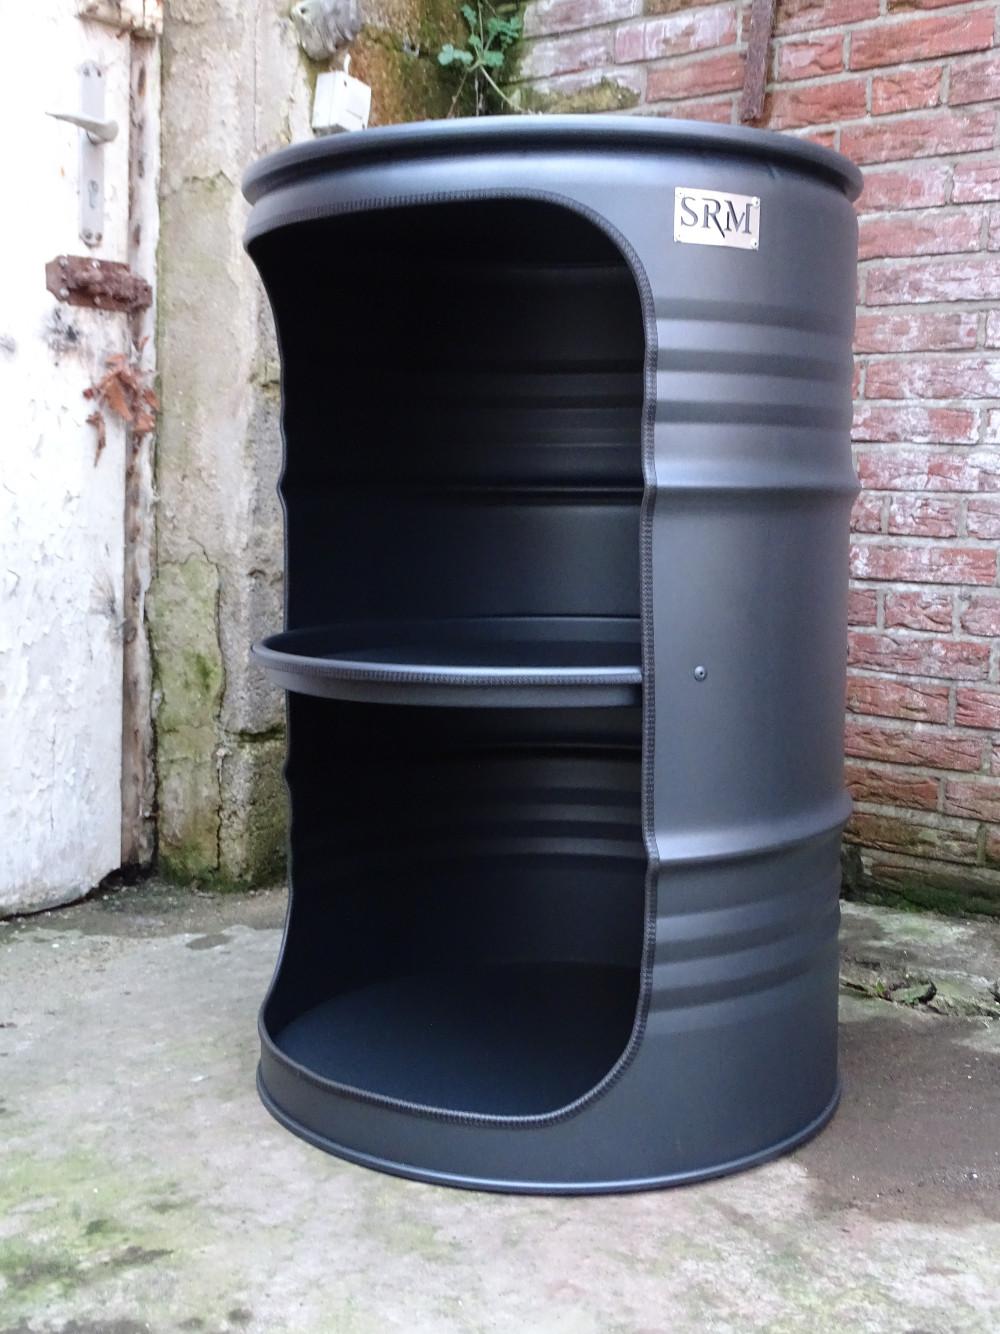 fassm bel design regal lfass 210 liter mit beleuchtung. Black Bedroom Furniture Sets. Home Design Ideas